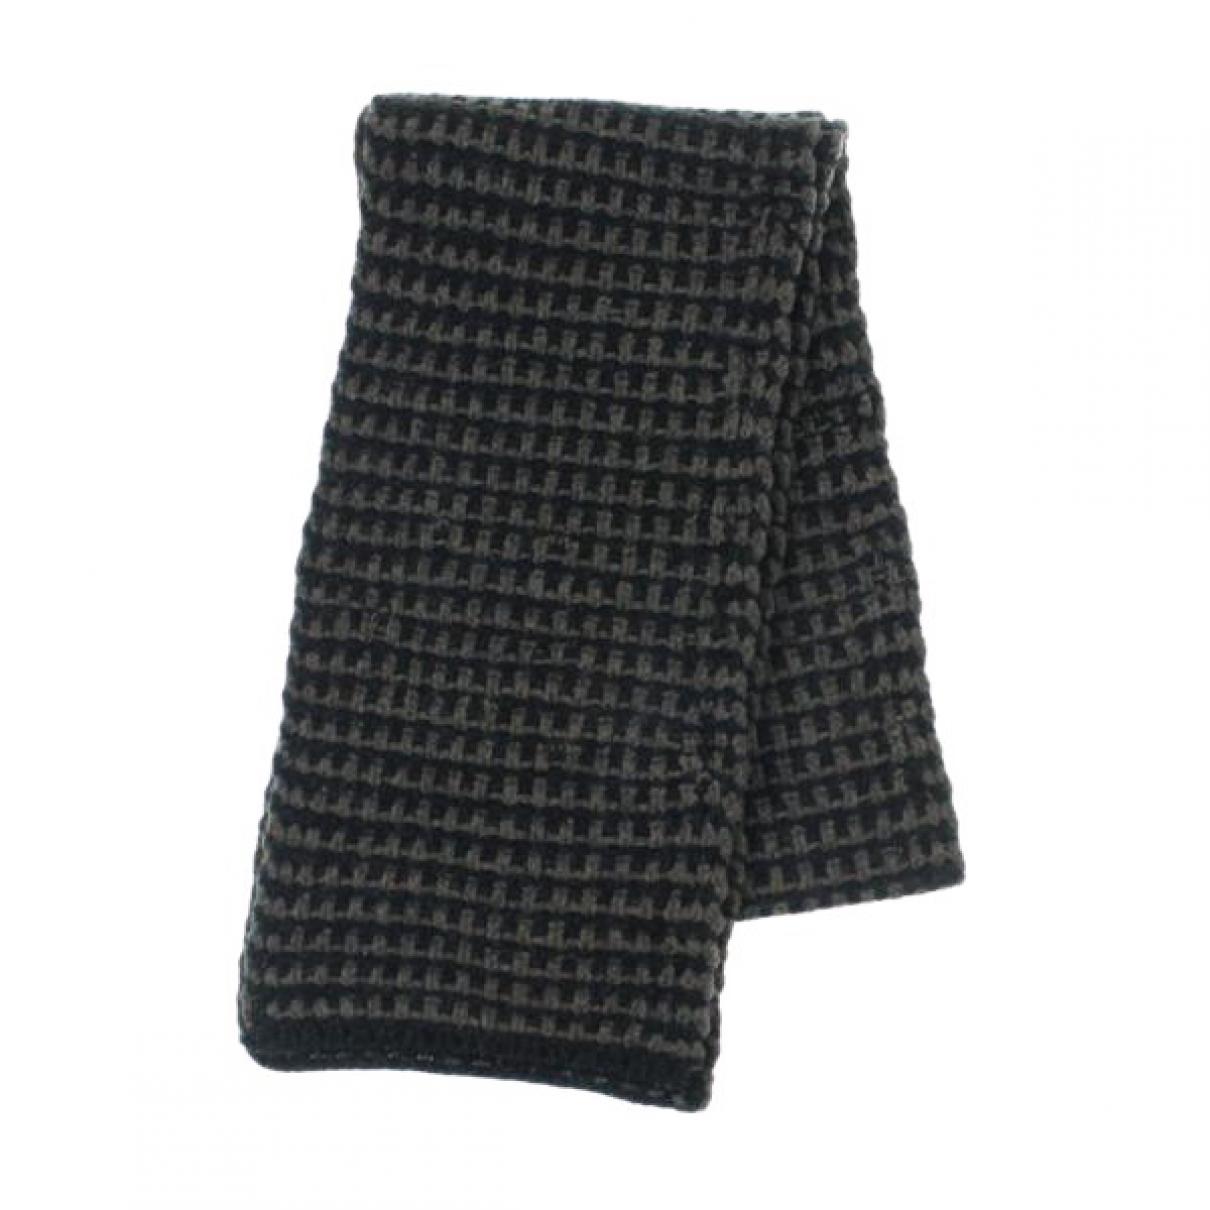 Dries Van Noten \N Schal in  Schwarz Wolle